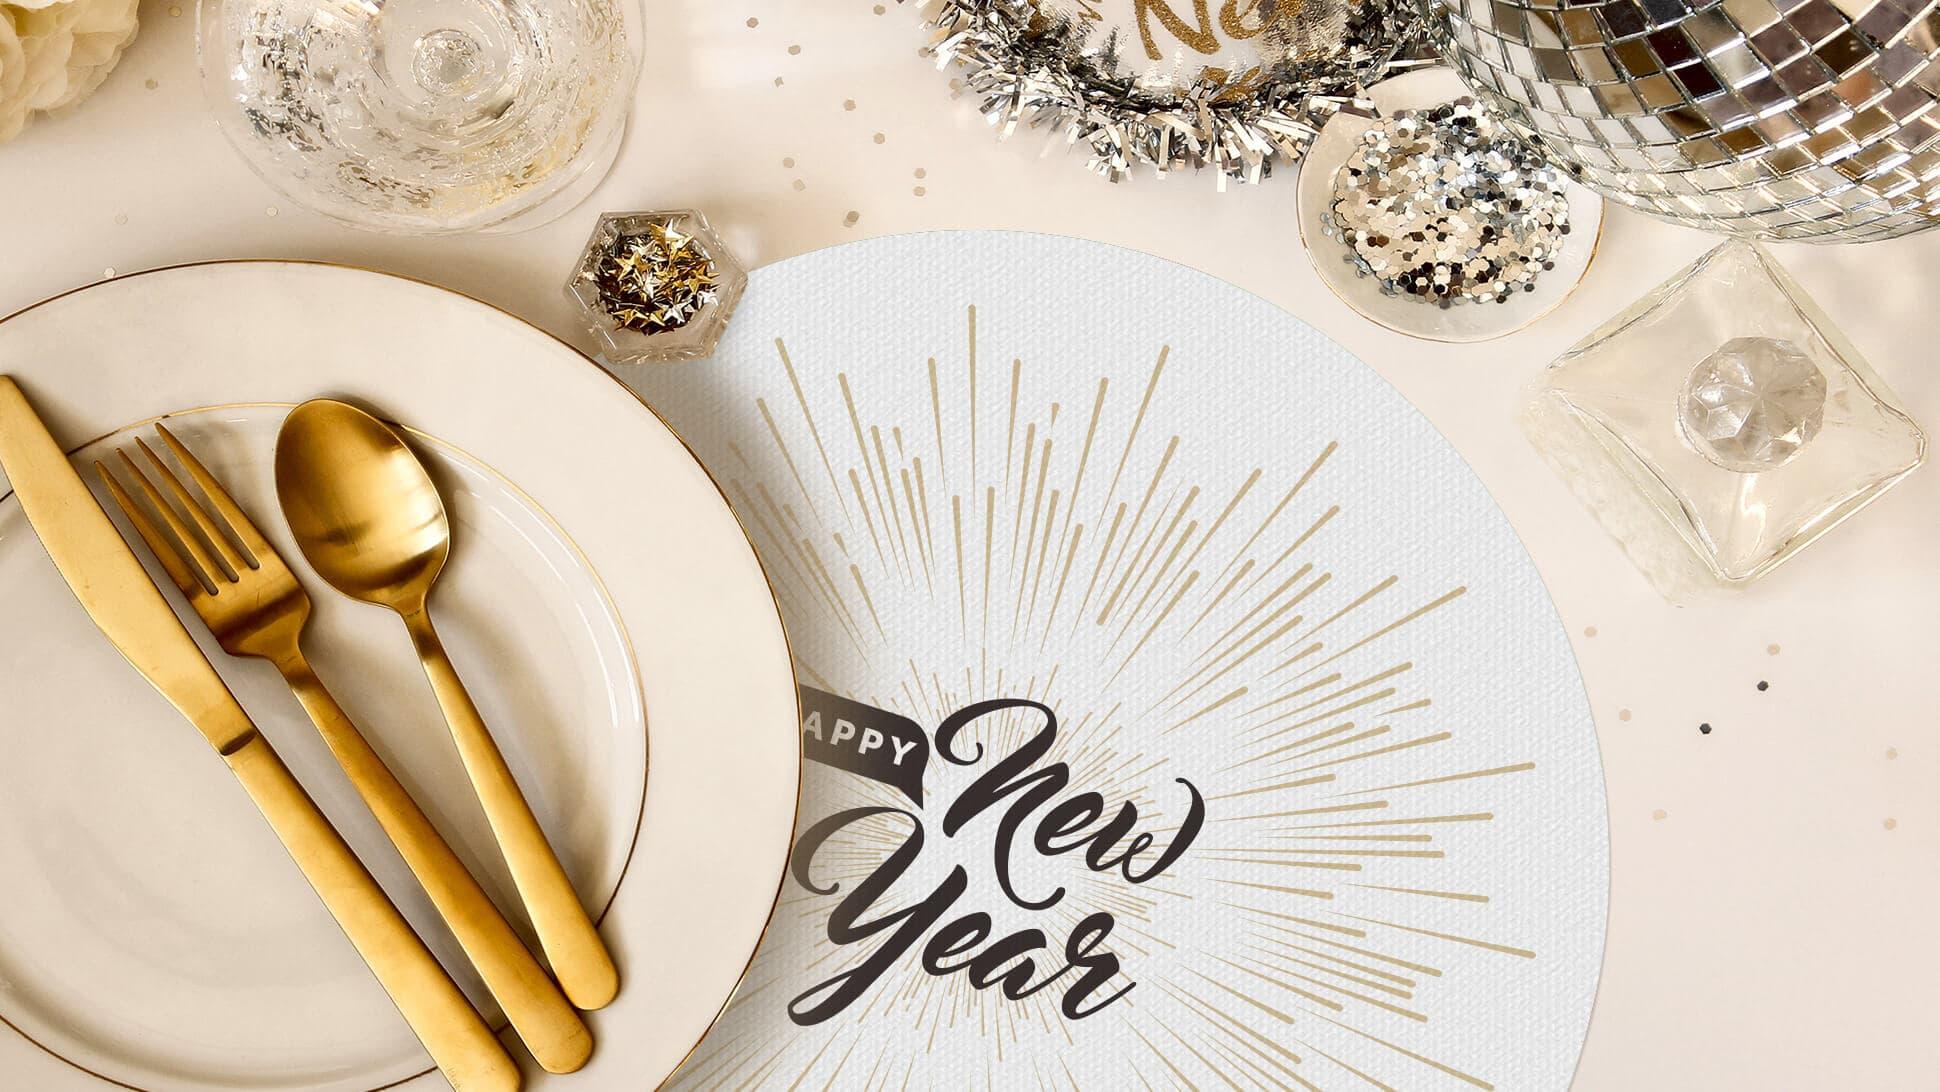 Tovaglietta happy new year prestampata | tictac.it